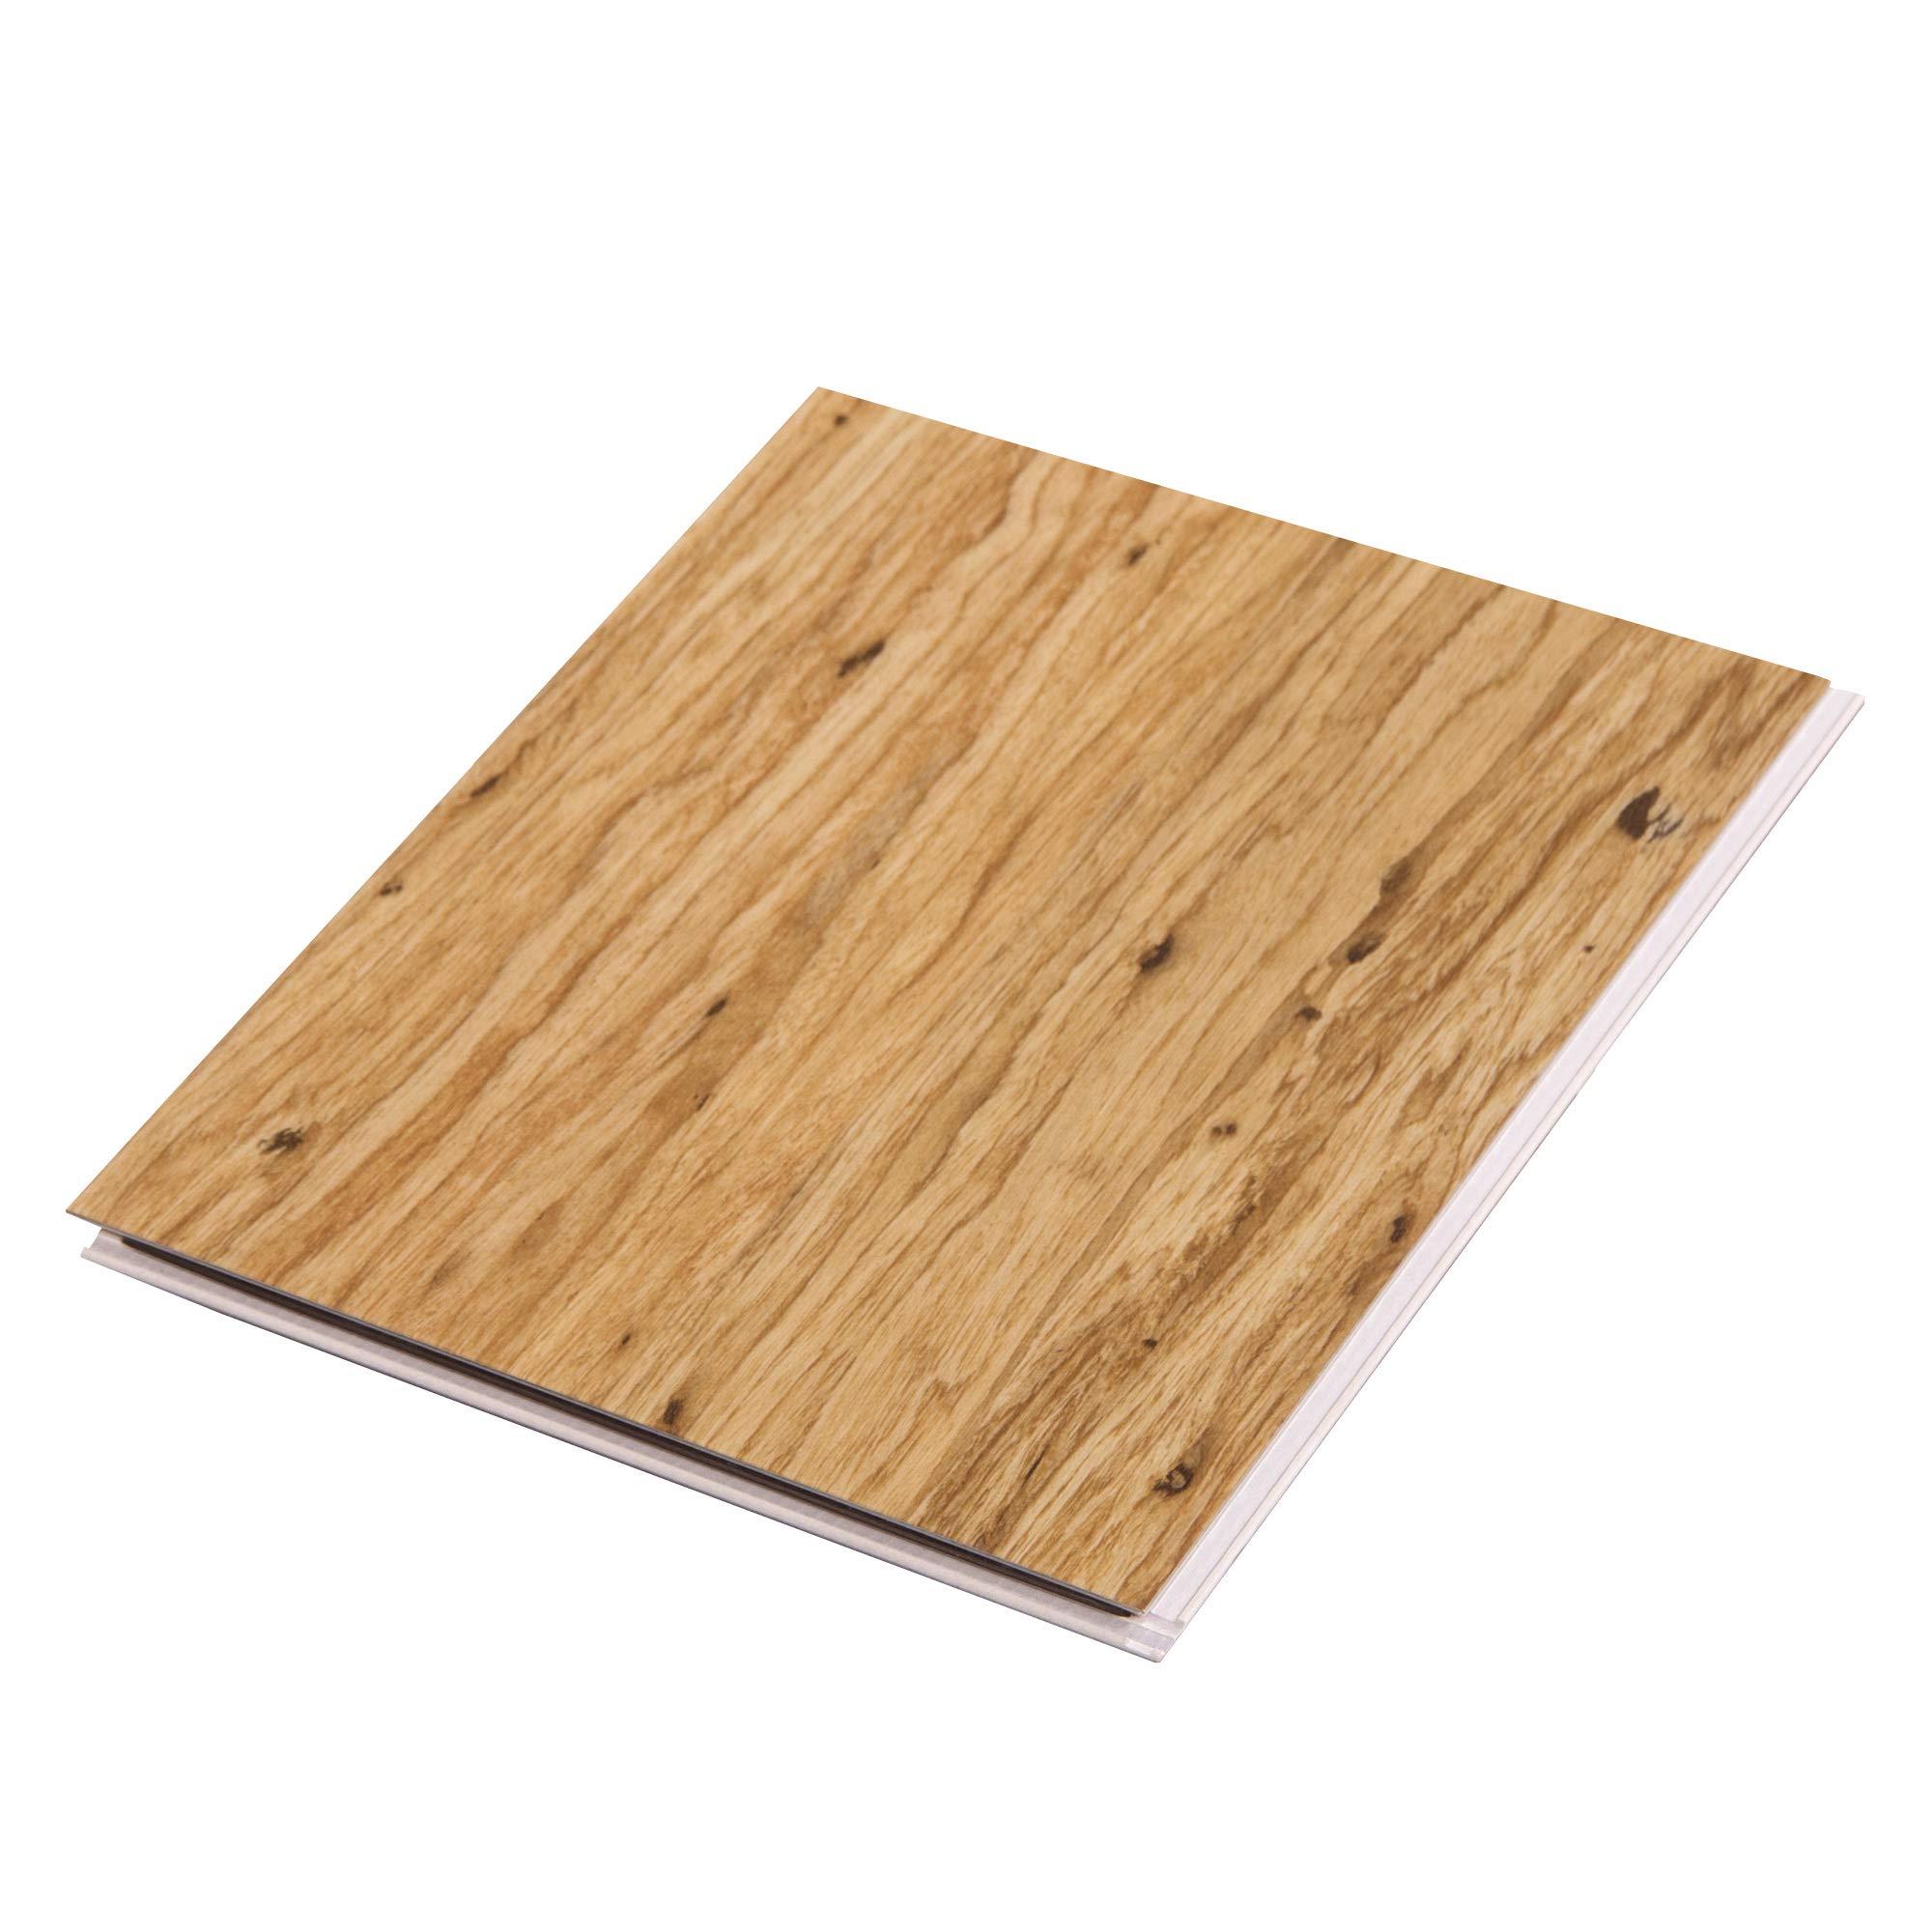 Sample - Natural Eucalyptus PRO Wide+ Click Vinyl Plank Flooring